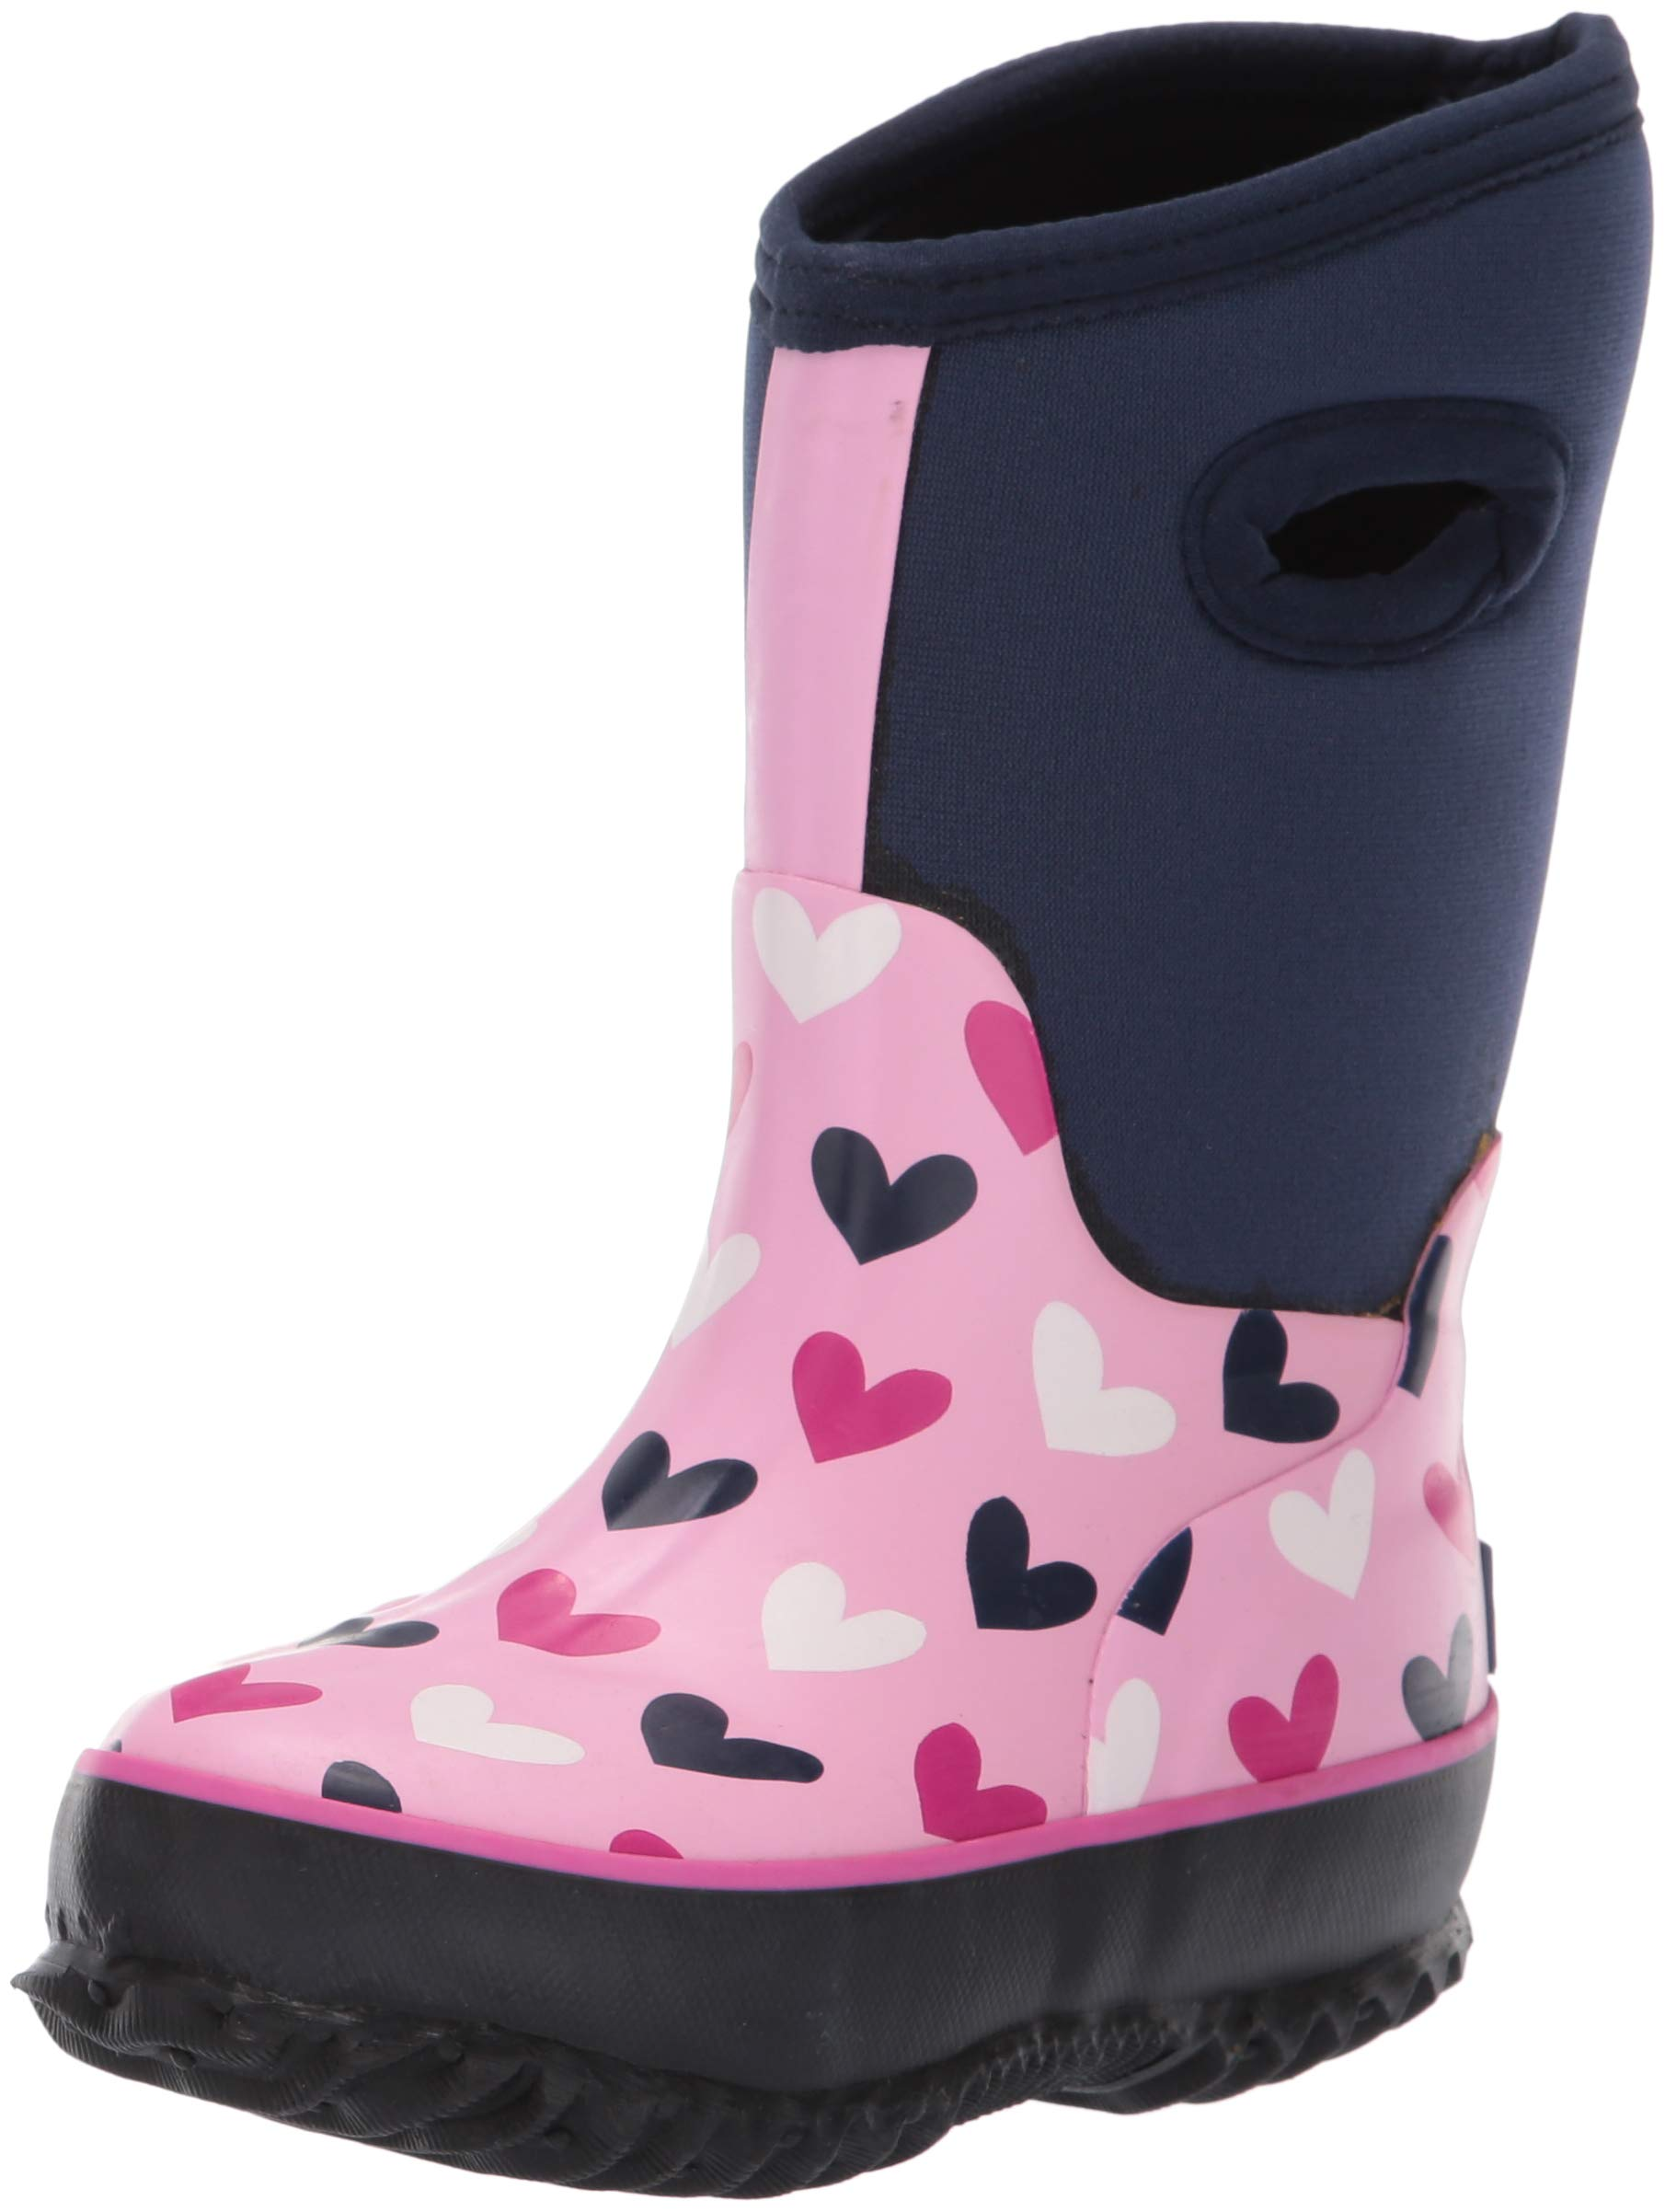 Hatley Girls' Big Neoprene Boots, Multi Hearts, 3 US by Hatley